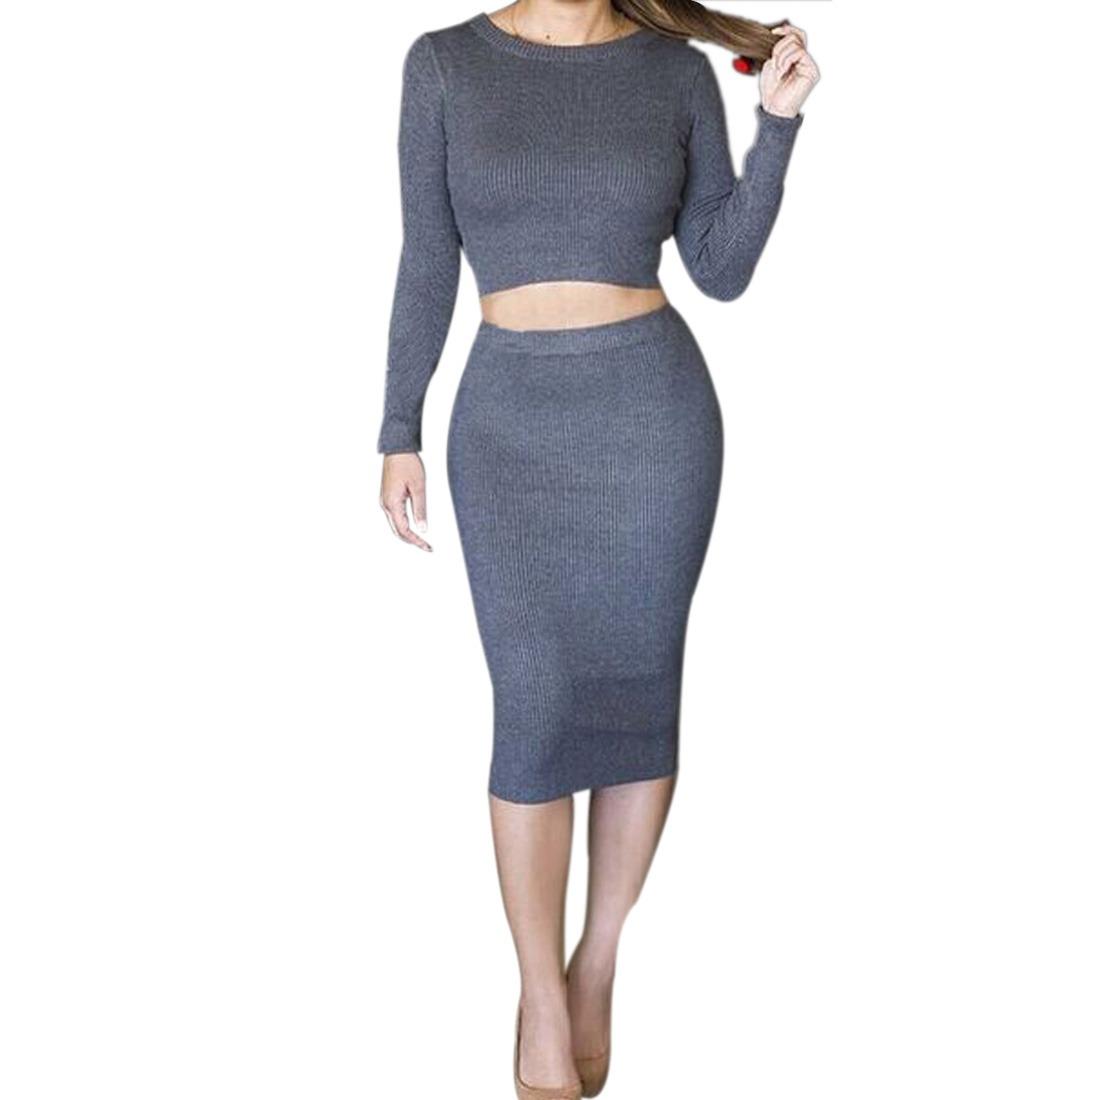 Womens 2 Piece long sleeve thick Bodycon Crop Tops Skirt Sweater Dress jupe